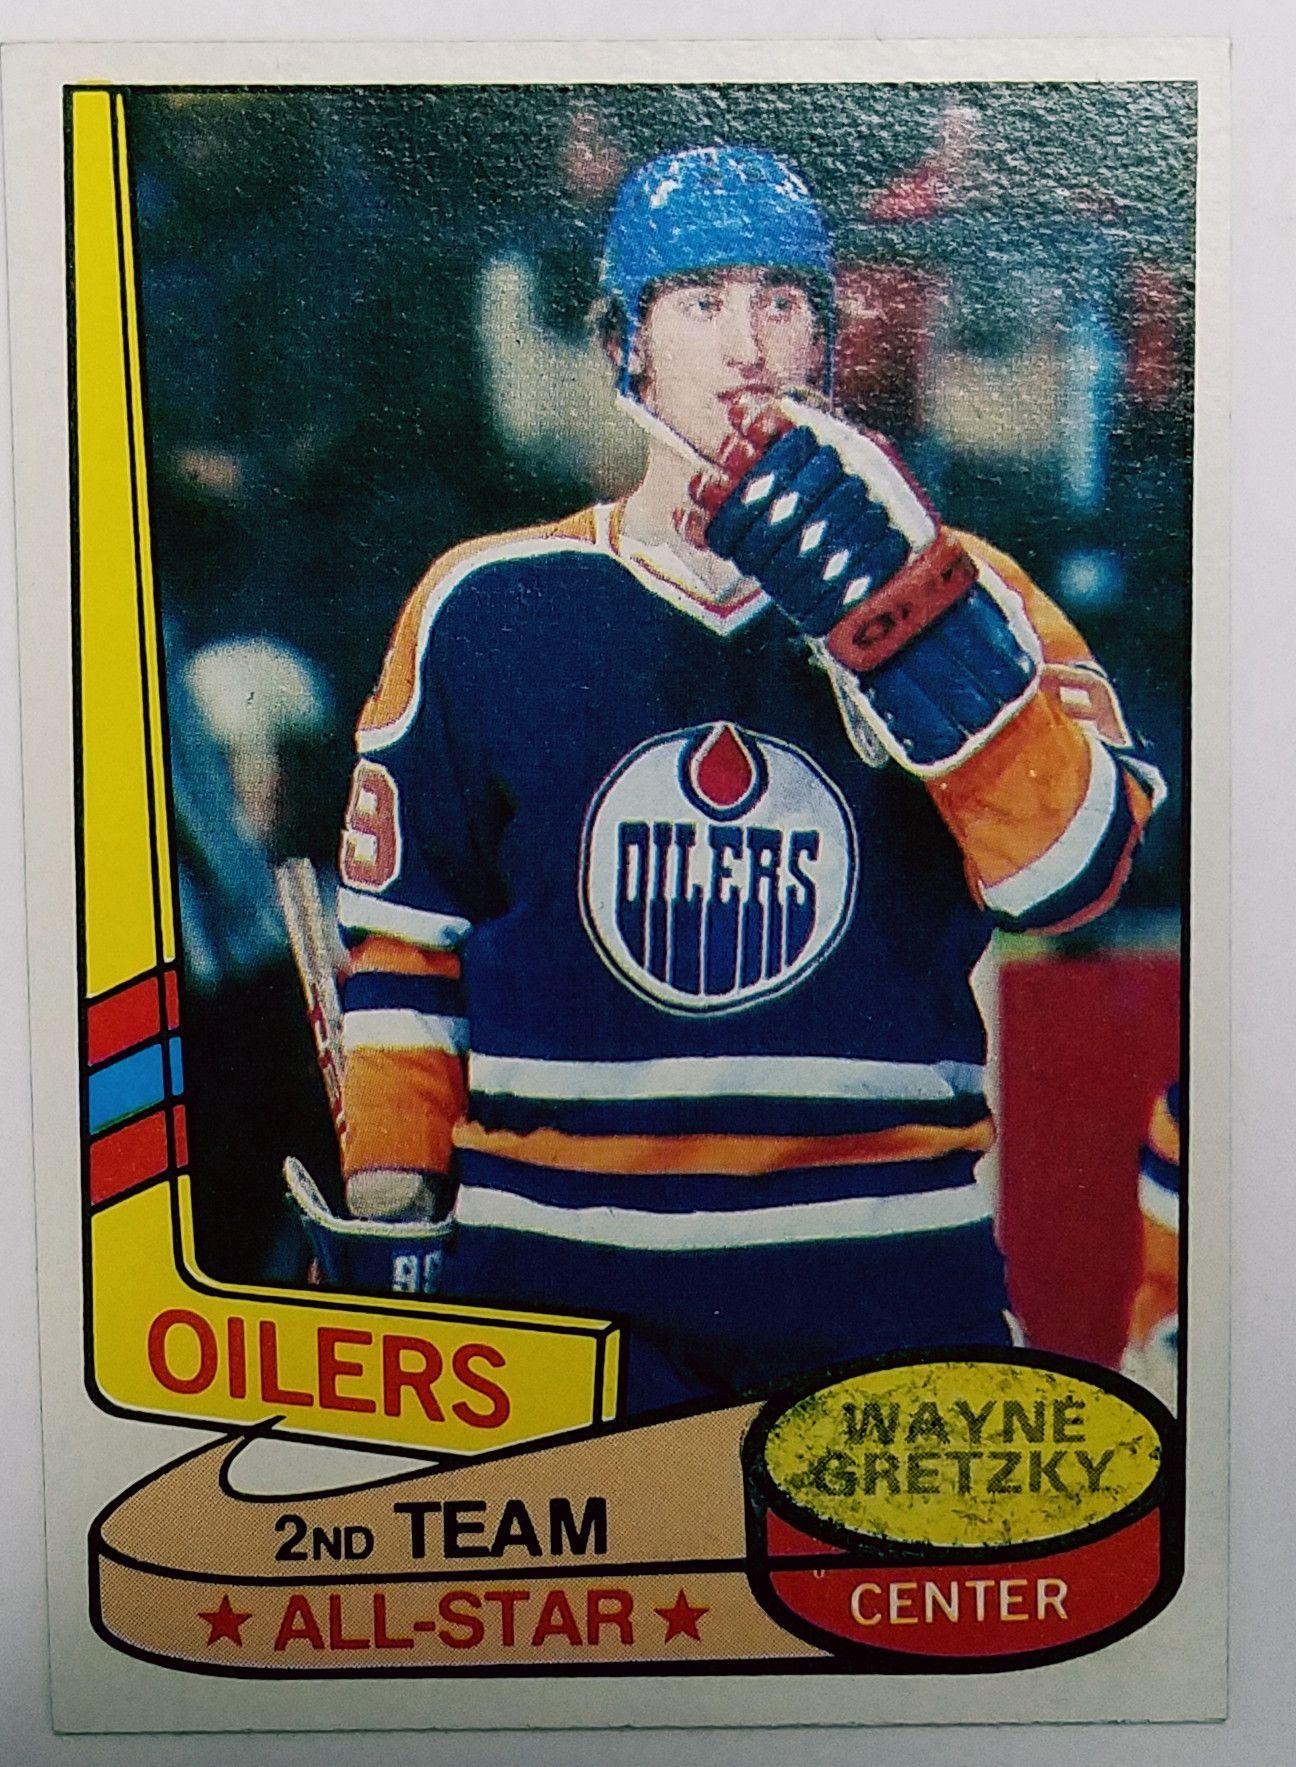 1980 Topps 87 Wayne Gretzky 2nd Year Early Original Gretzky Card Edmonton Oilers Hockey All Star Hof Stanley Wayne Gretzky Hockey Cards Edmonton Oilers